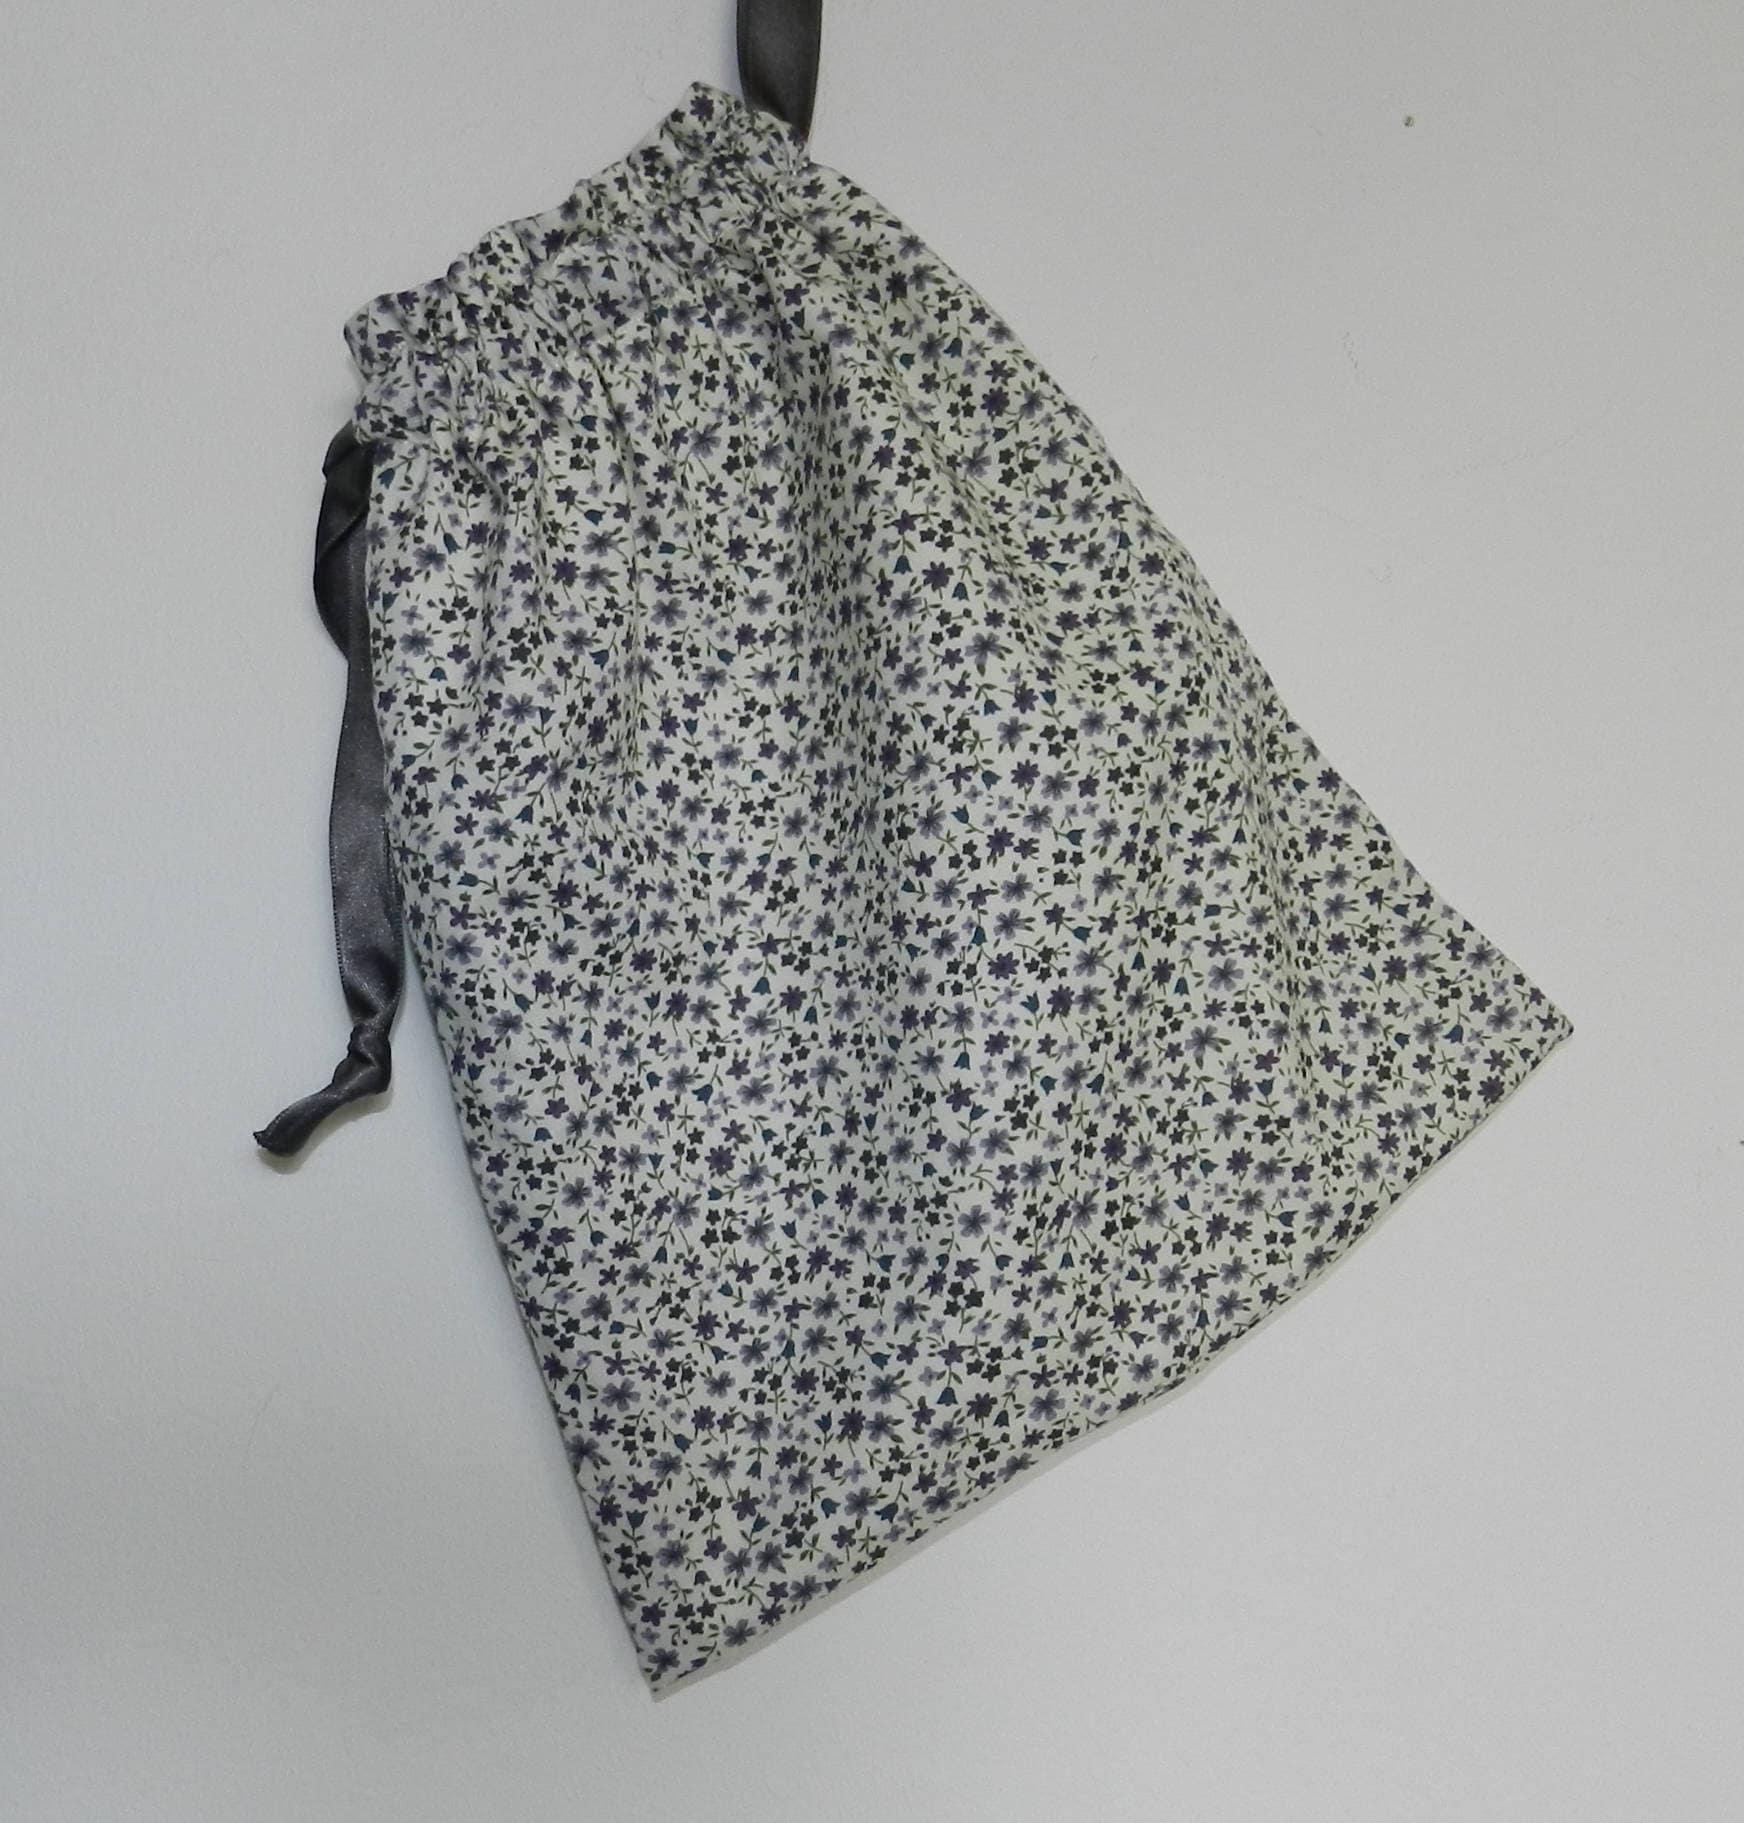 sac pochon sac linge sac doudou avec lien. Black Bedroom Furniture Sets. Home Design Ideas